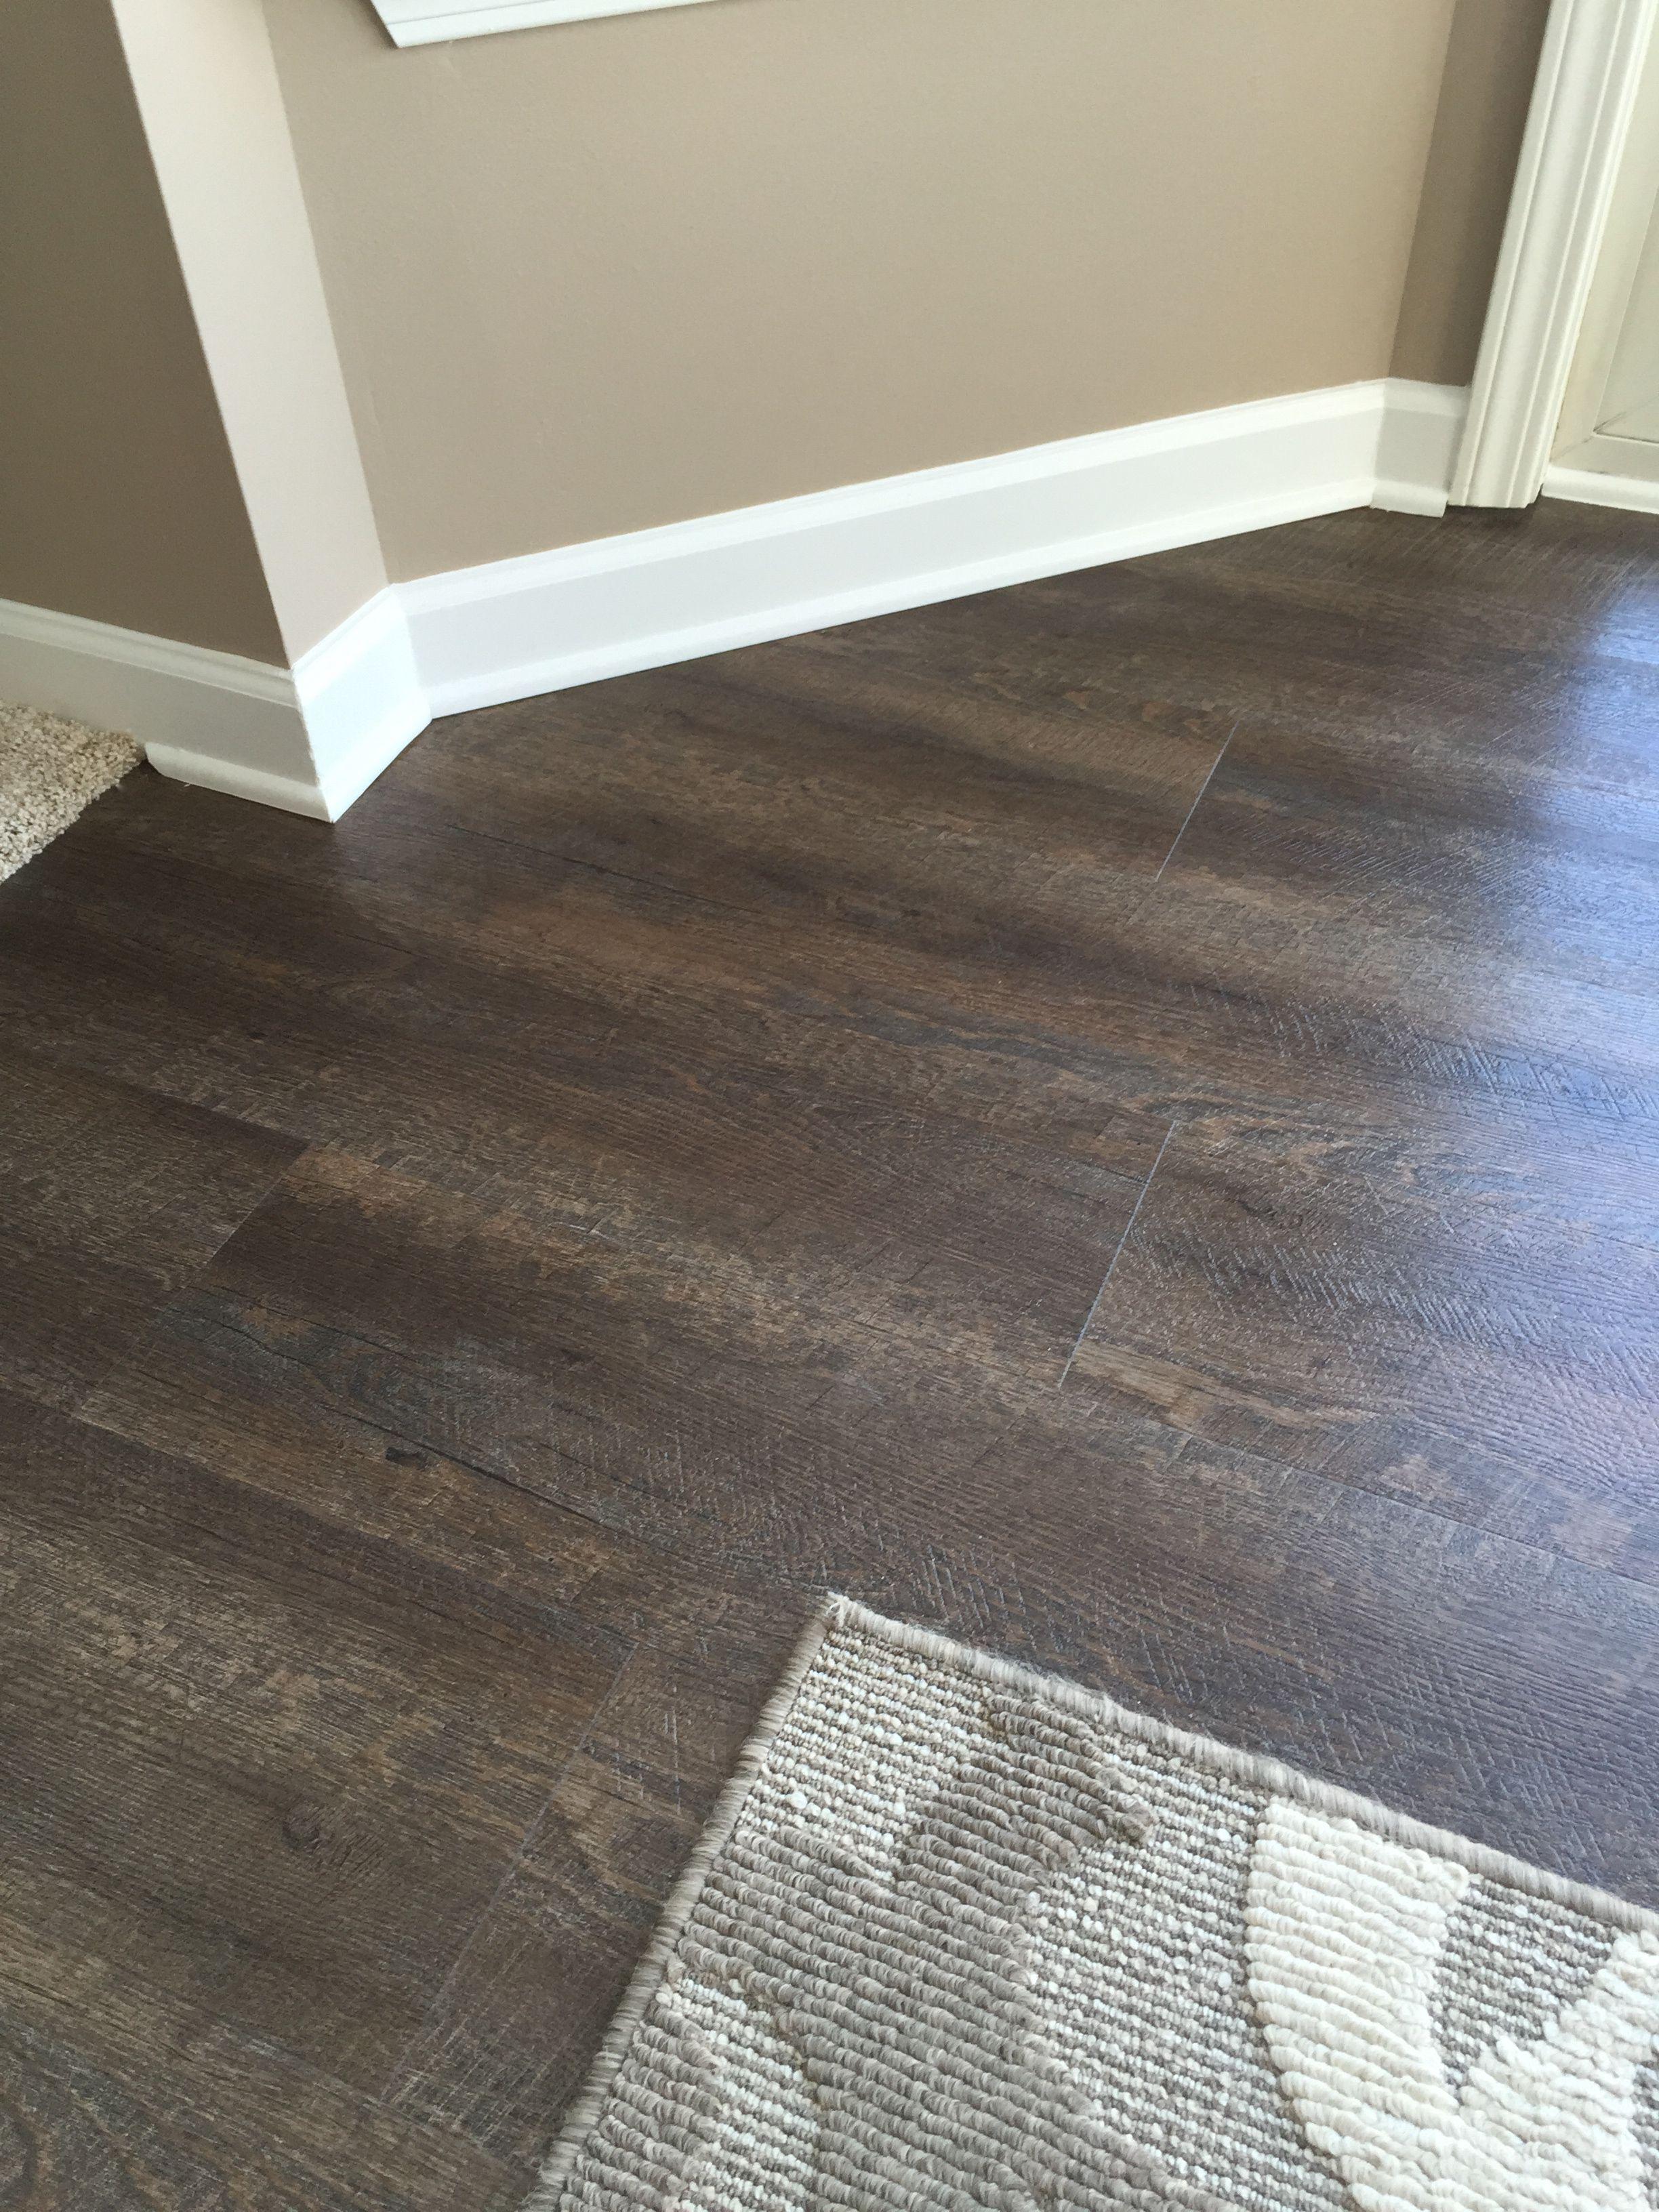 Home Depot Kitchen Flooring Corner Drawer Cabinet Trafficmaster Allure Sawcut Dakota Vinyl Planks